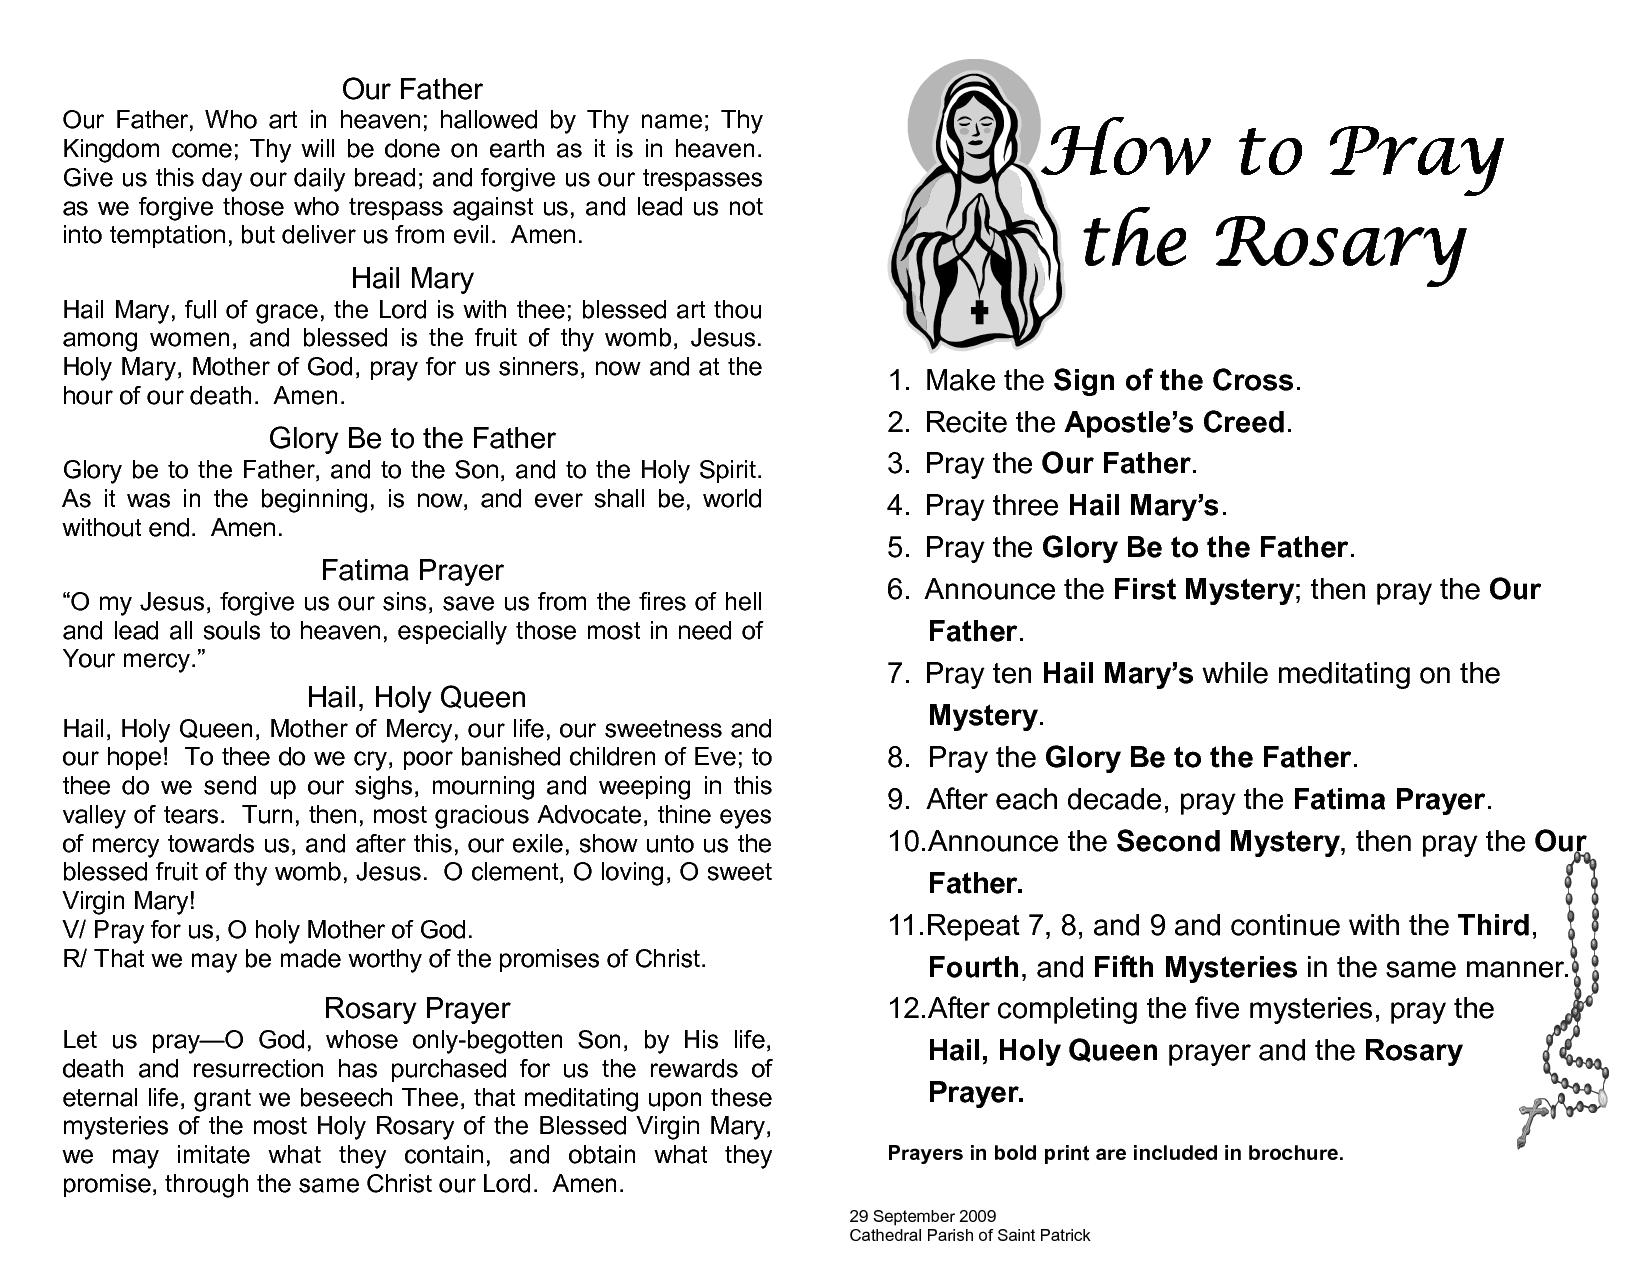 printable rosary prayer guide [ 1650 x 1275 Pixel ]